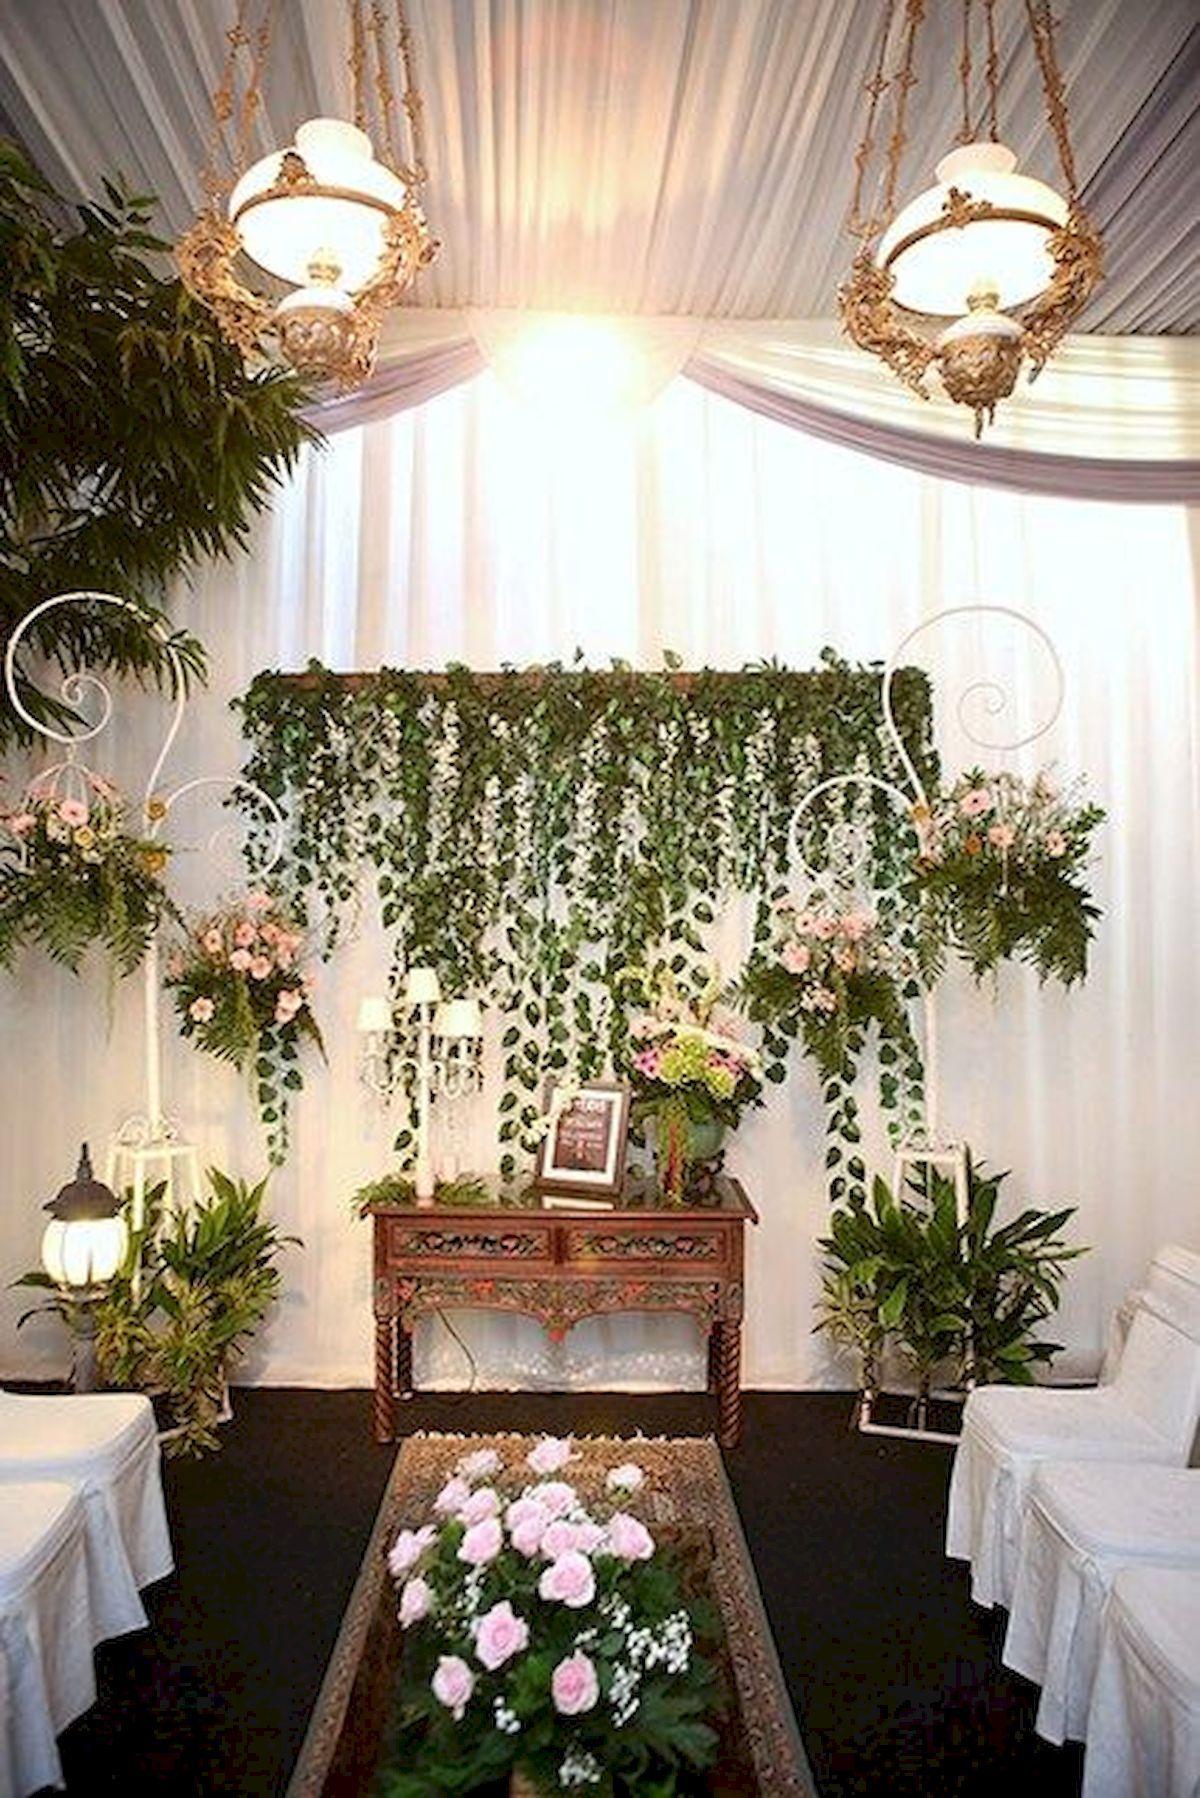 Outdoor Wedding Decoration Ideas - jihanshanum PARTY IDEAS ...